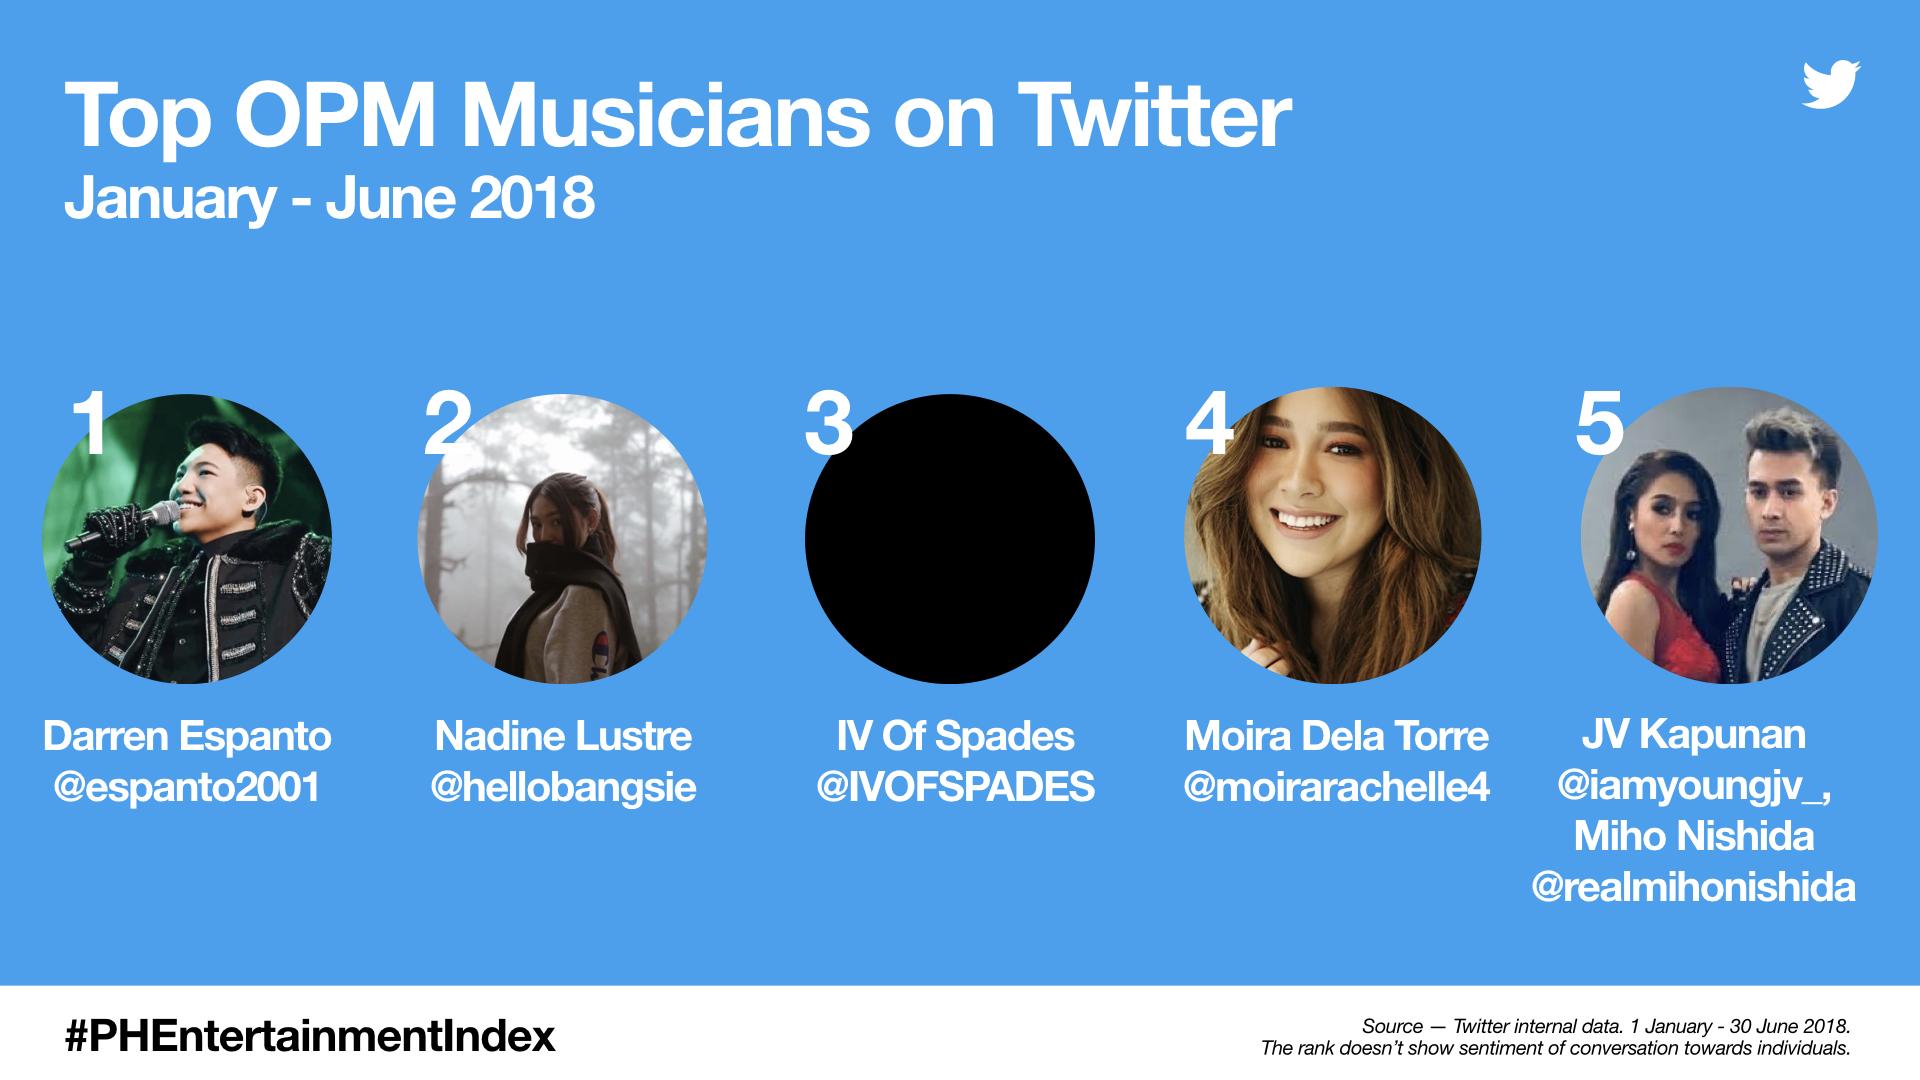 PH Entertainment Index - Top OPM Musicians (Jan-June 2018)